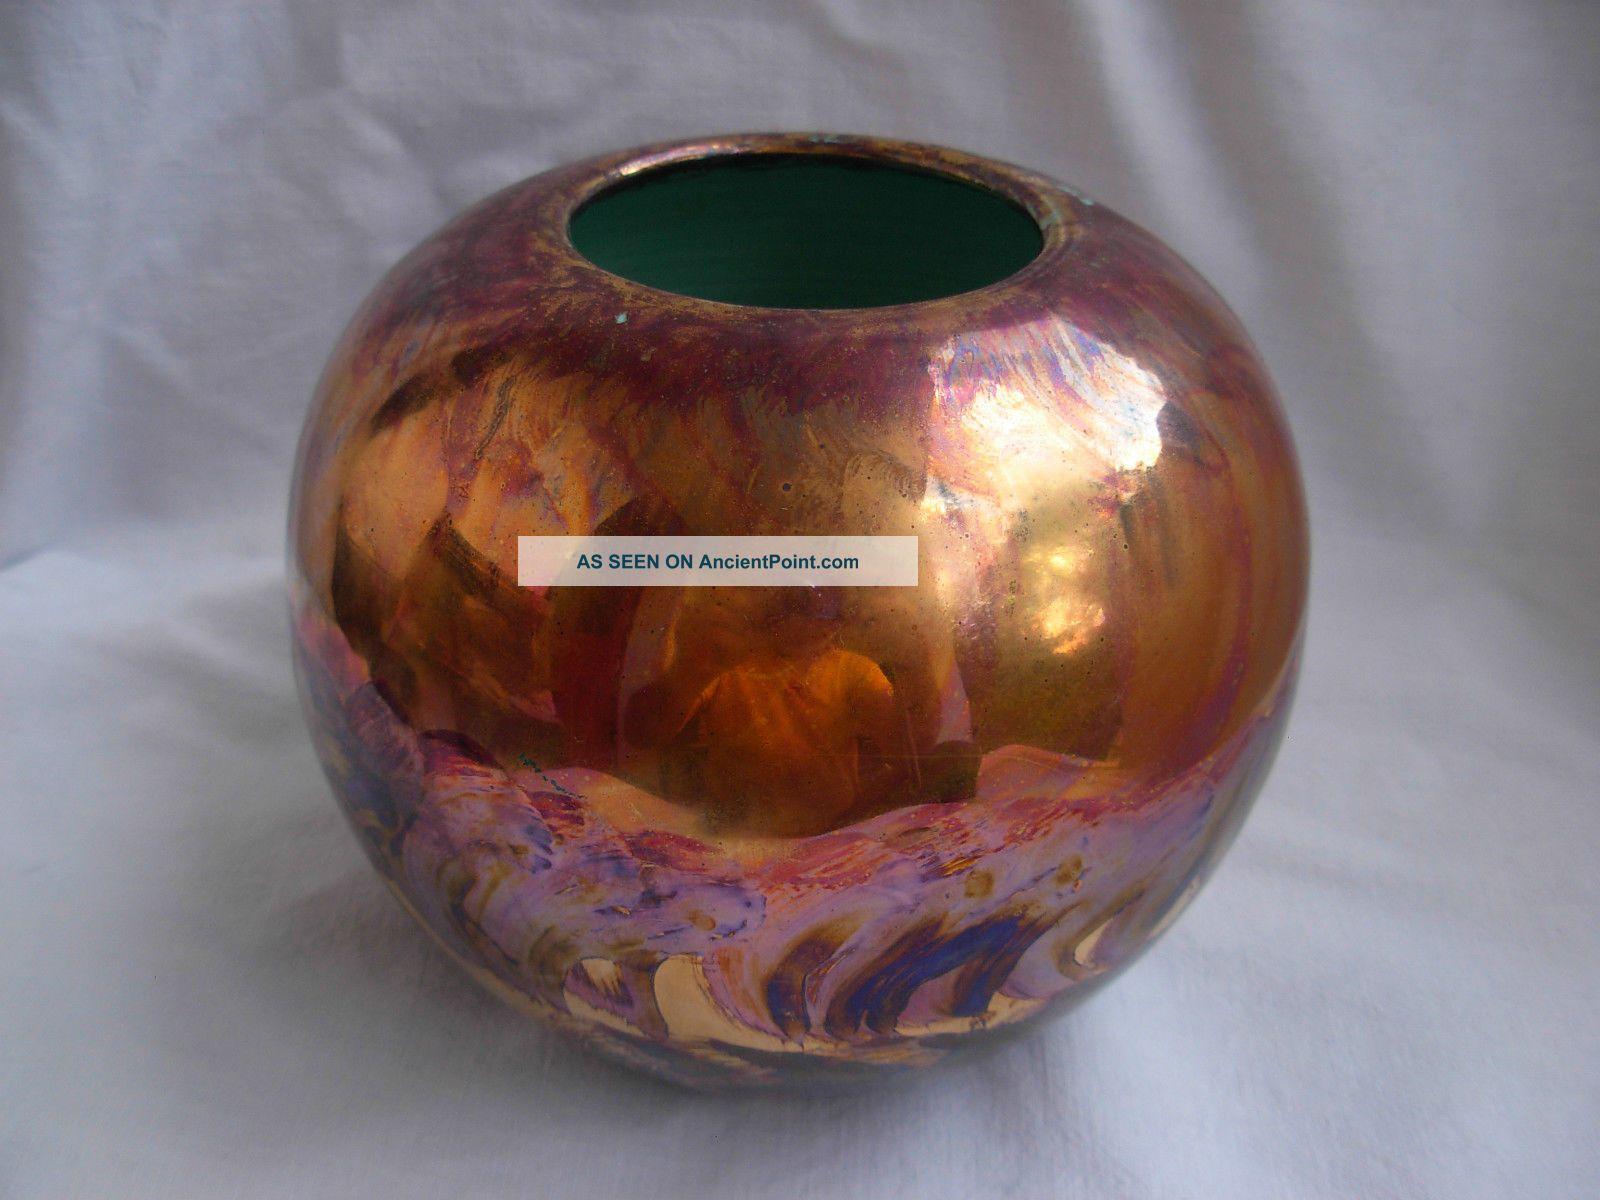 Vallauris,  French Art Deco Iridescent Ceramic Vase,  Signed,  1930 Years Art Deco photo